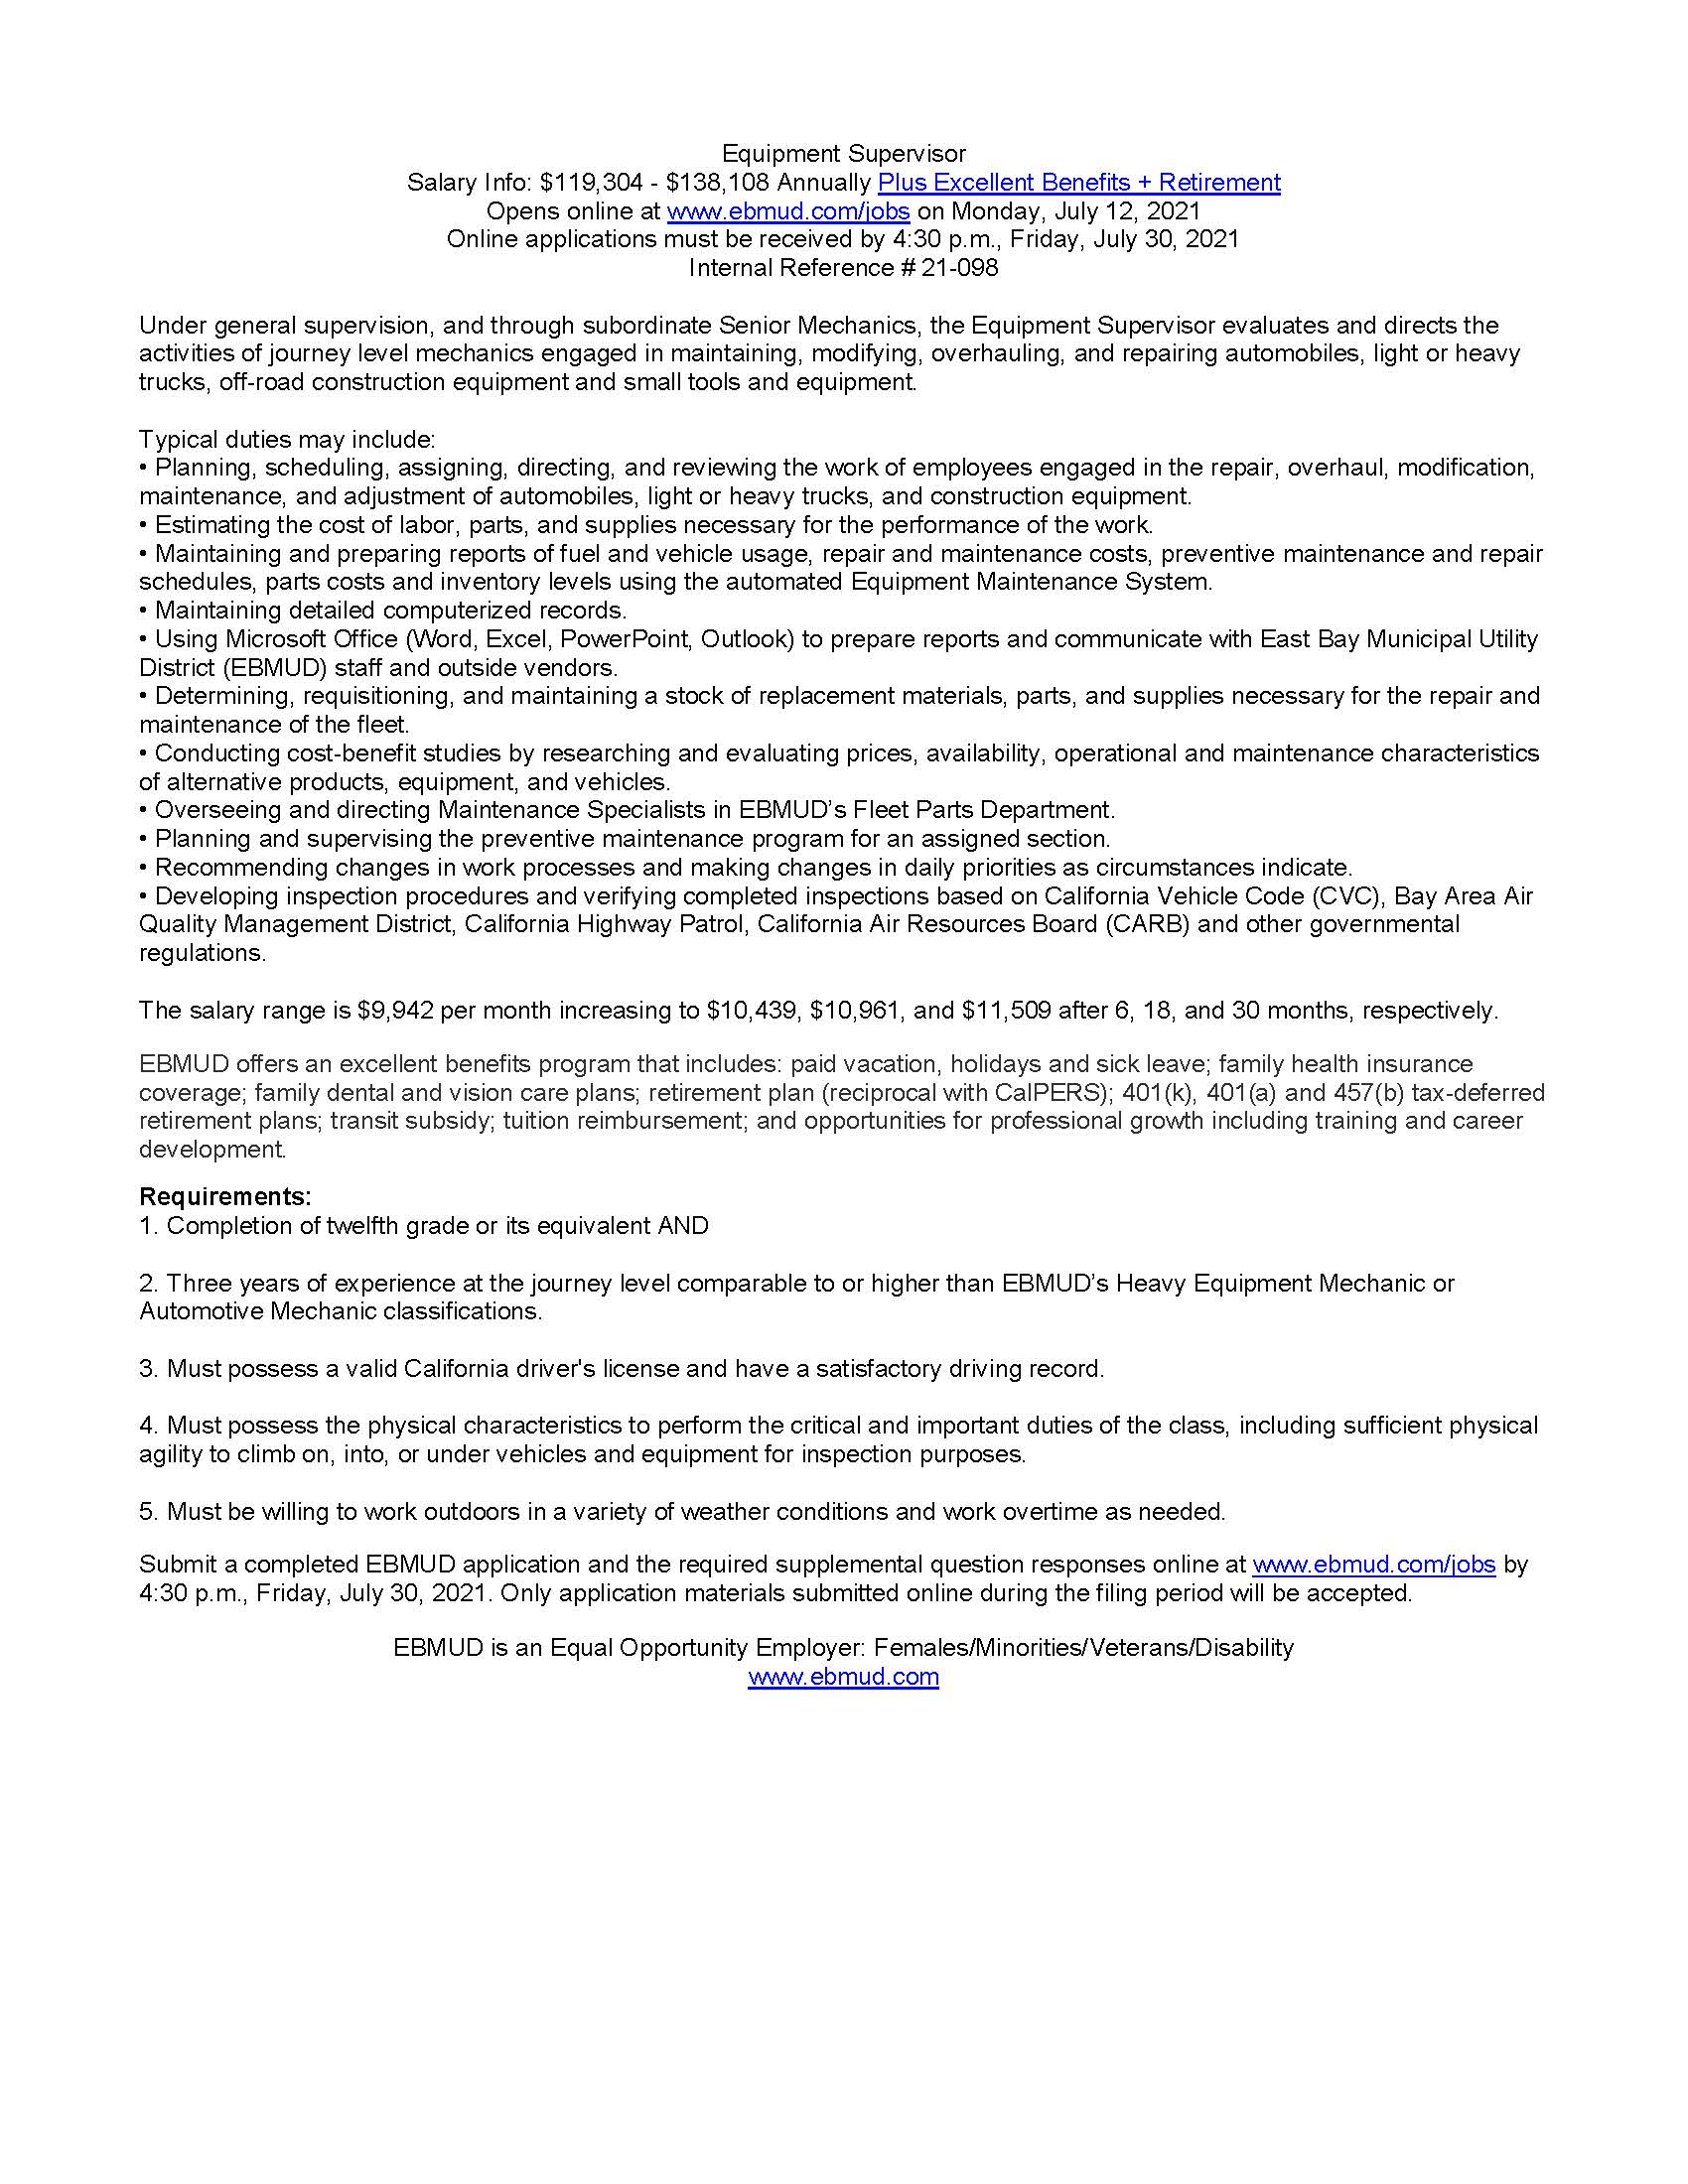 Equipment Supervisor Job Posting